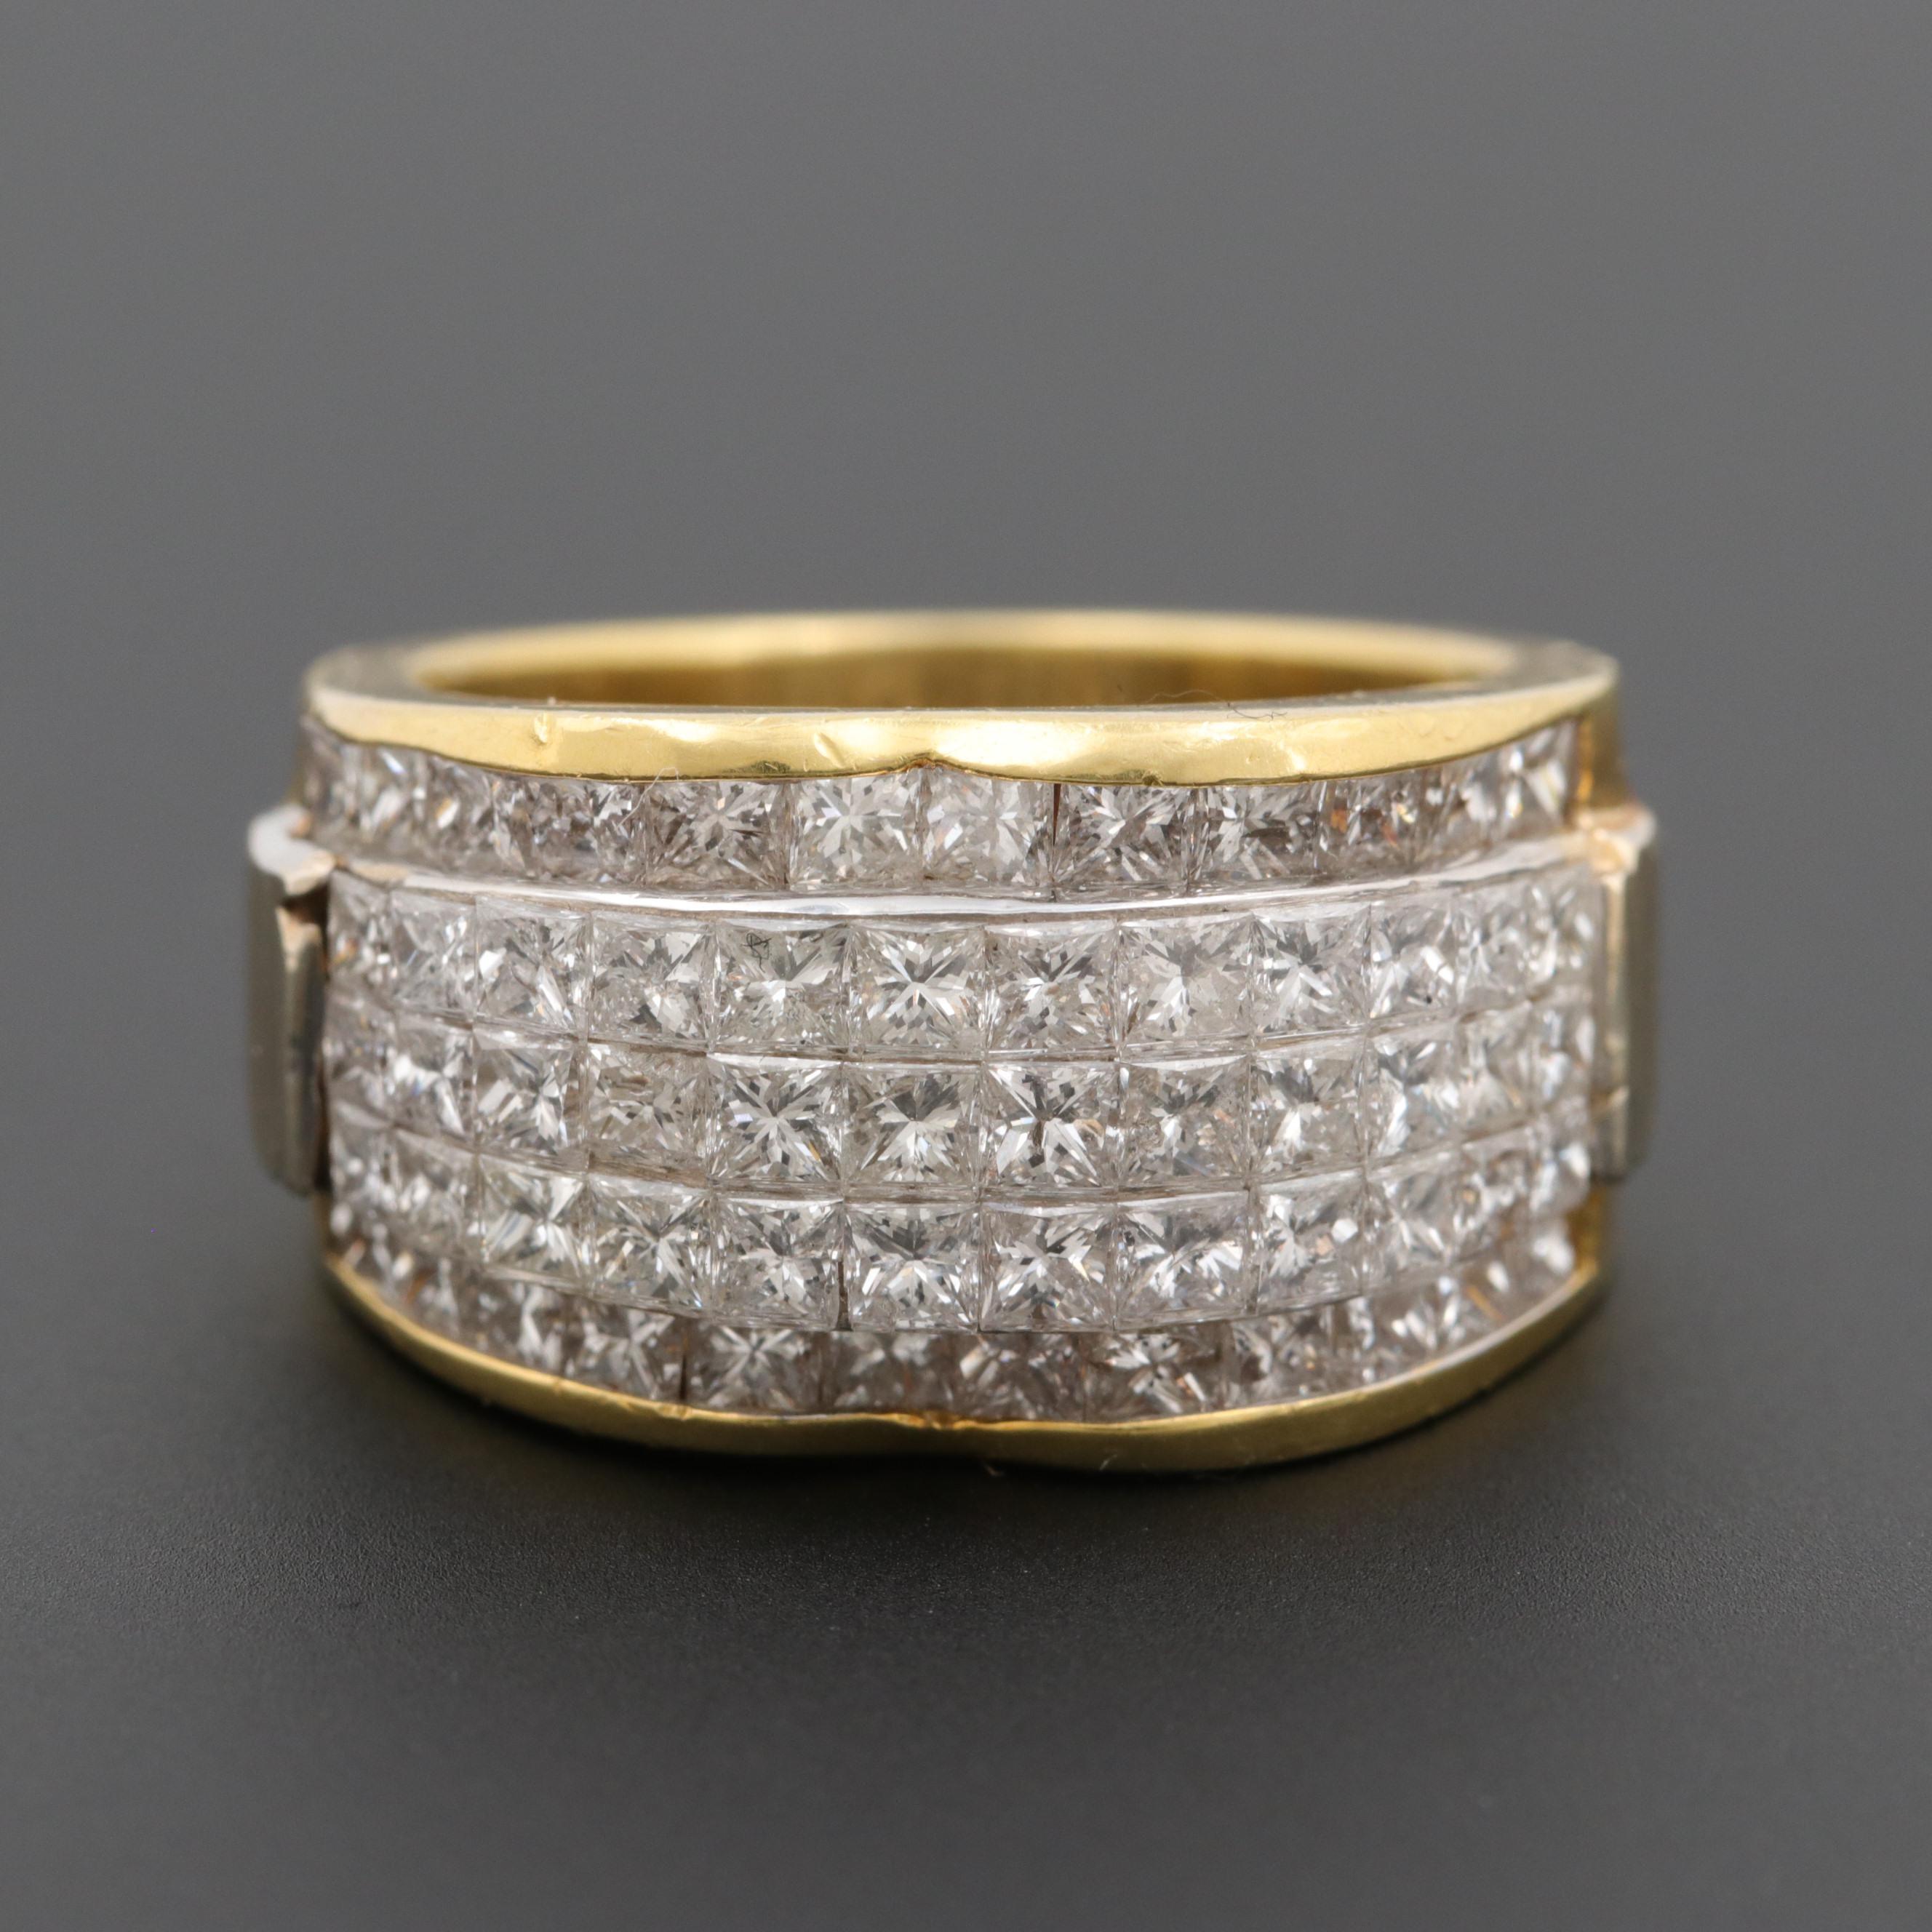 18K Yellow Gold 3.00 CTW Diamond Ring with 18K White Gold Setting